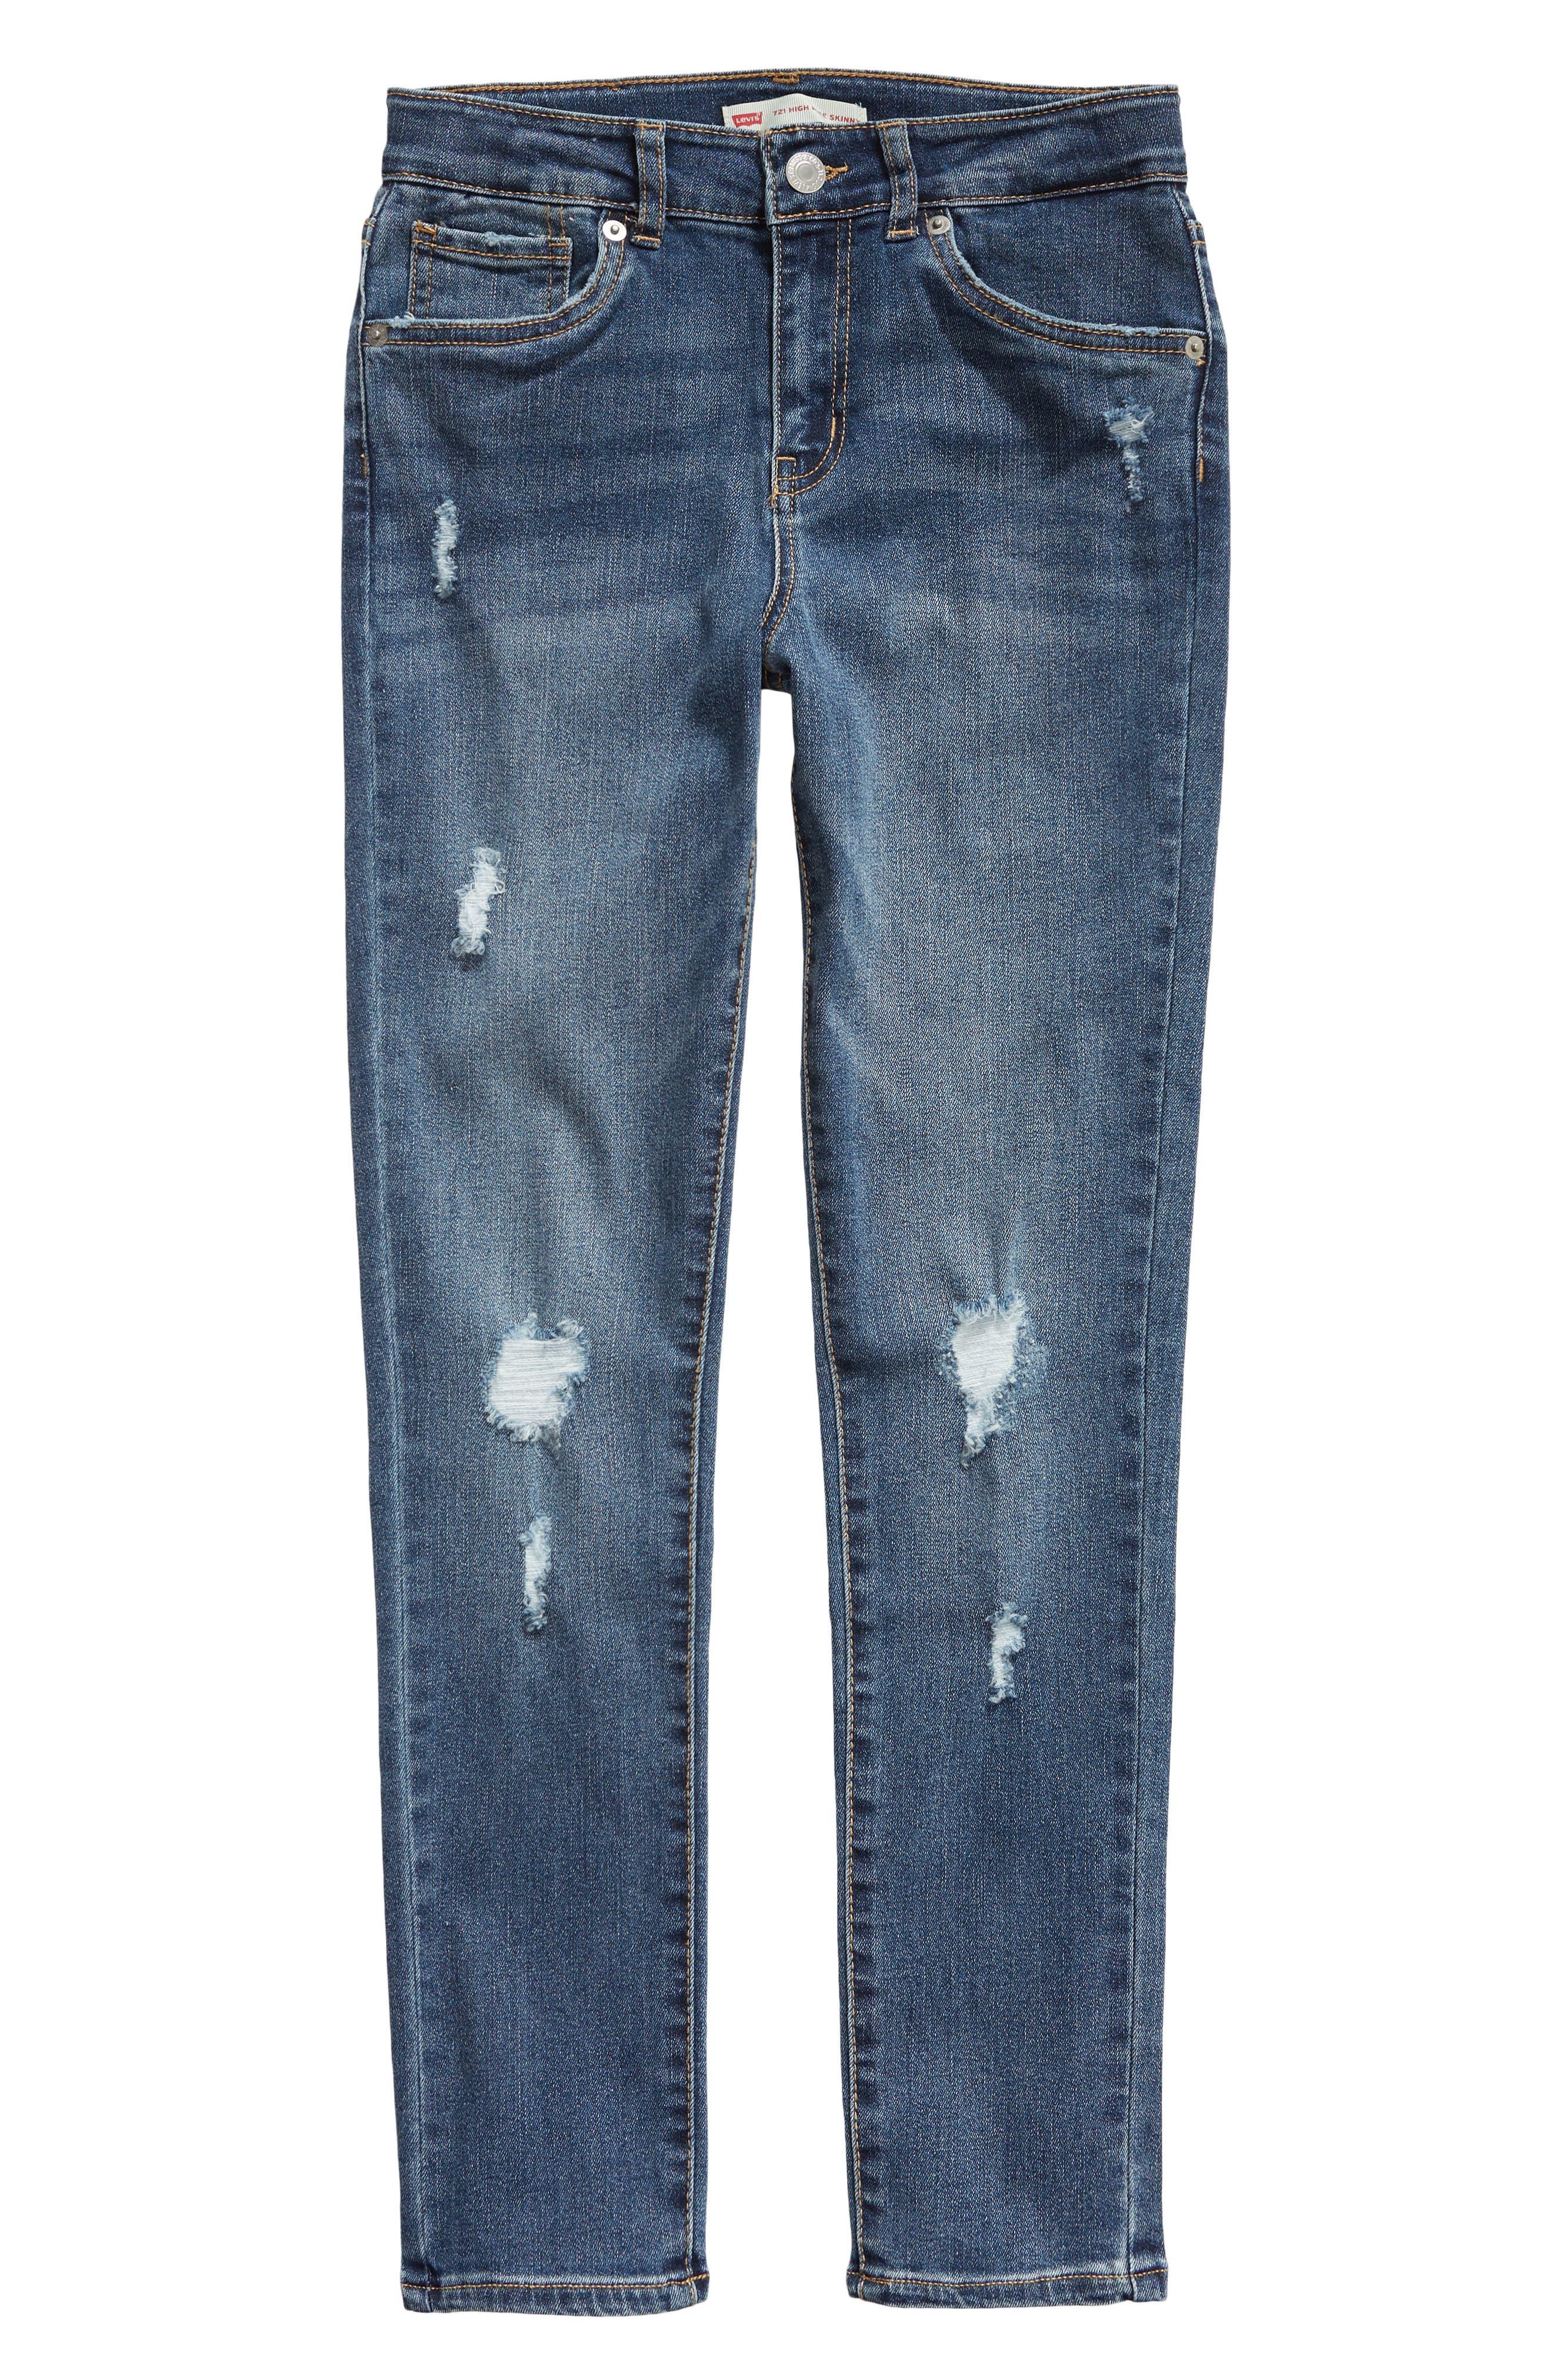 LEVI'S<SUP>®</SUP>,                             721<sup>™</sup> High Waist Skinny Jeans,                             Main thumbnail 1, color,                             M7V-MAKE OR BREAK